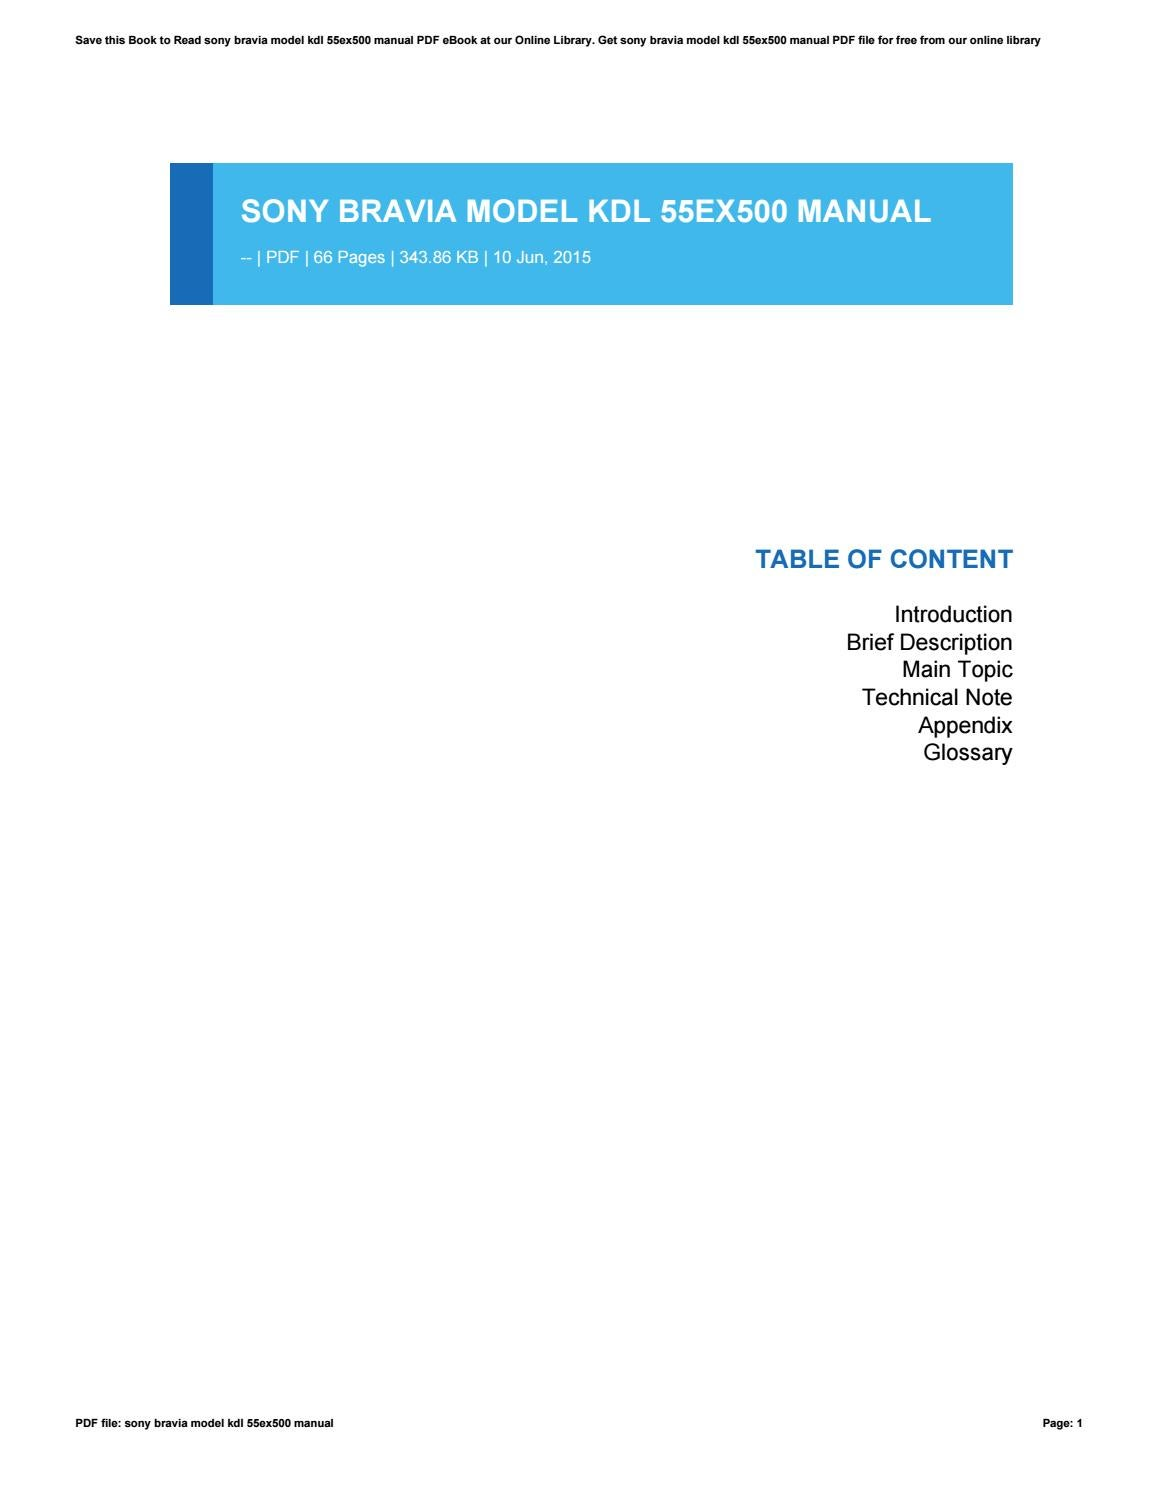 author Array - sony bravia model kdl 55ex500 manual by despacito96citos  issuu rh issuu ...